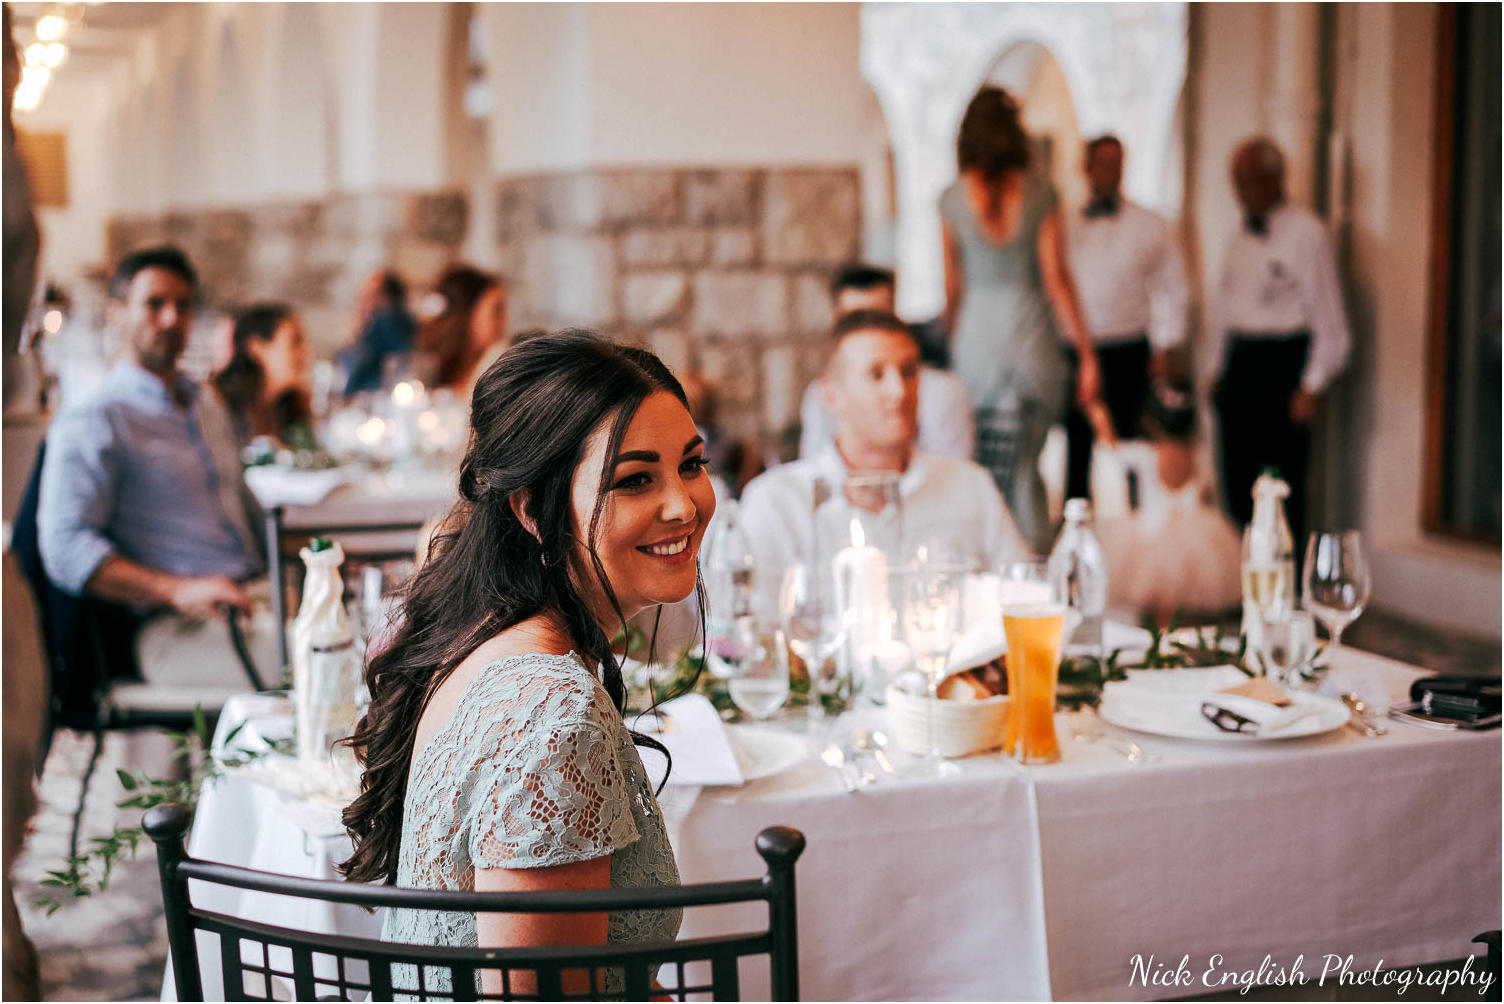 Destination_Wedding_Photographer_Slovenia_Nick_English_Photography-82.jpg